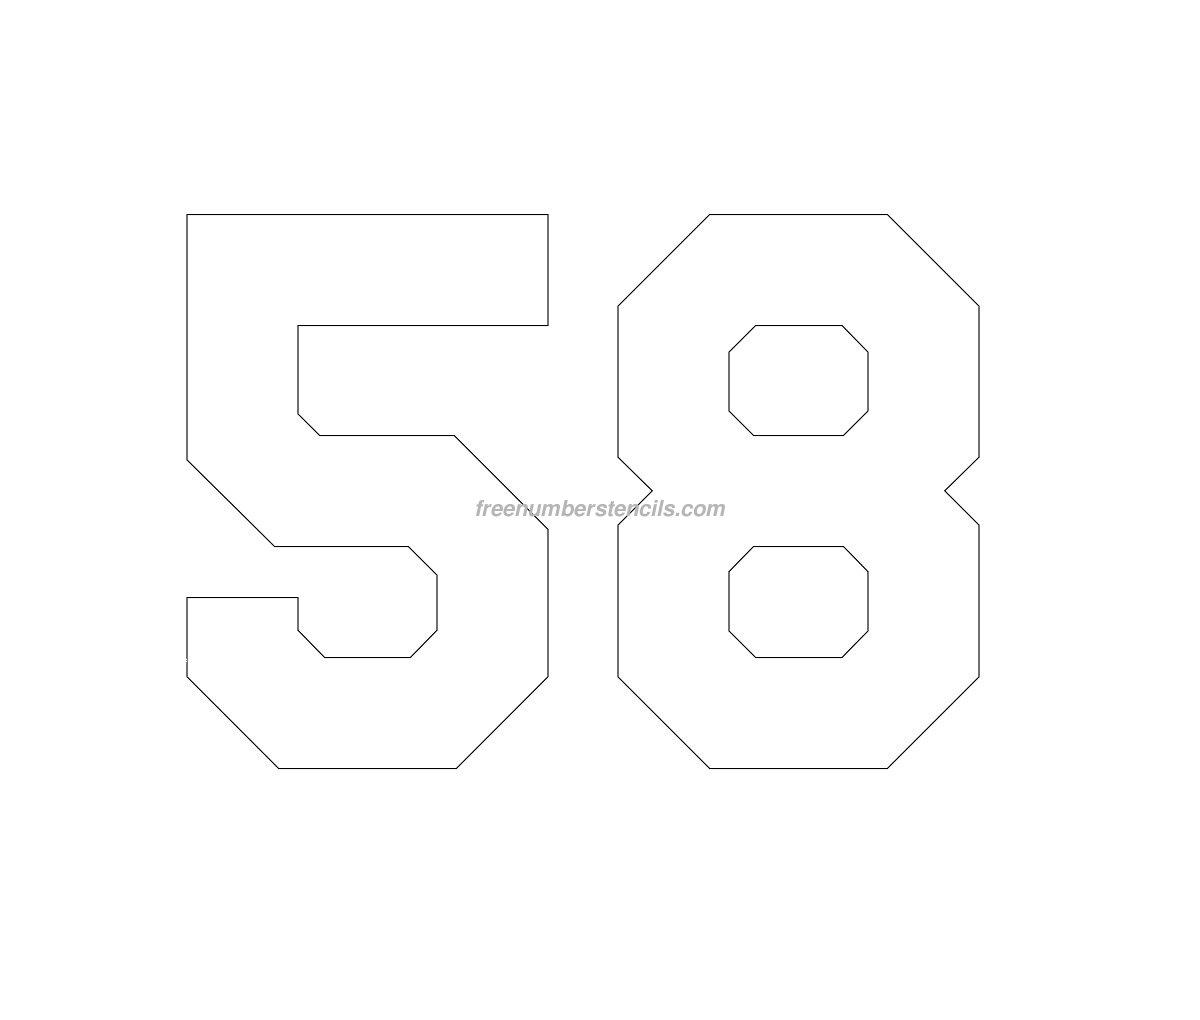 free jersey printable 58 number stencil freenumberstencils com